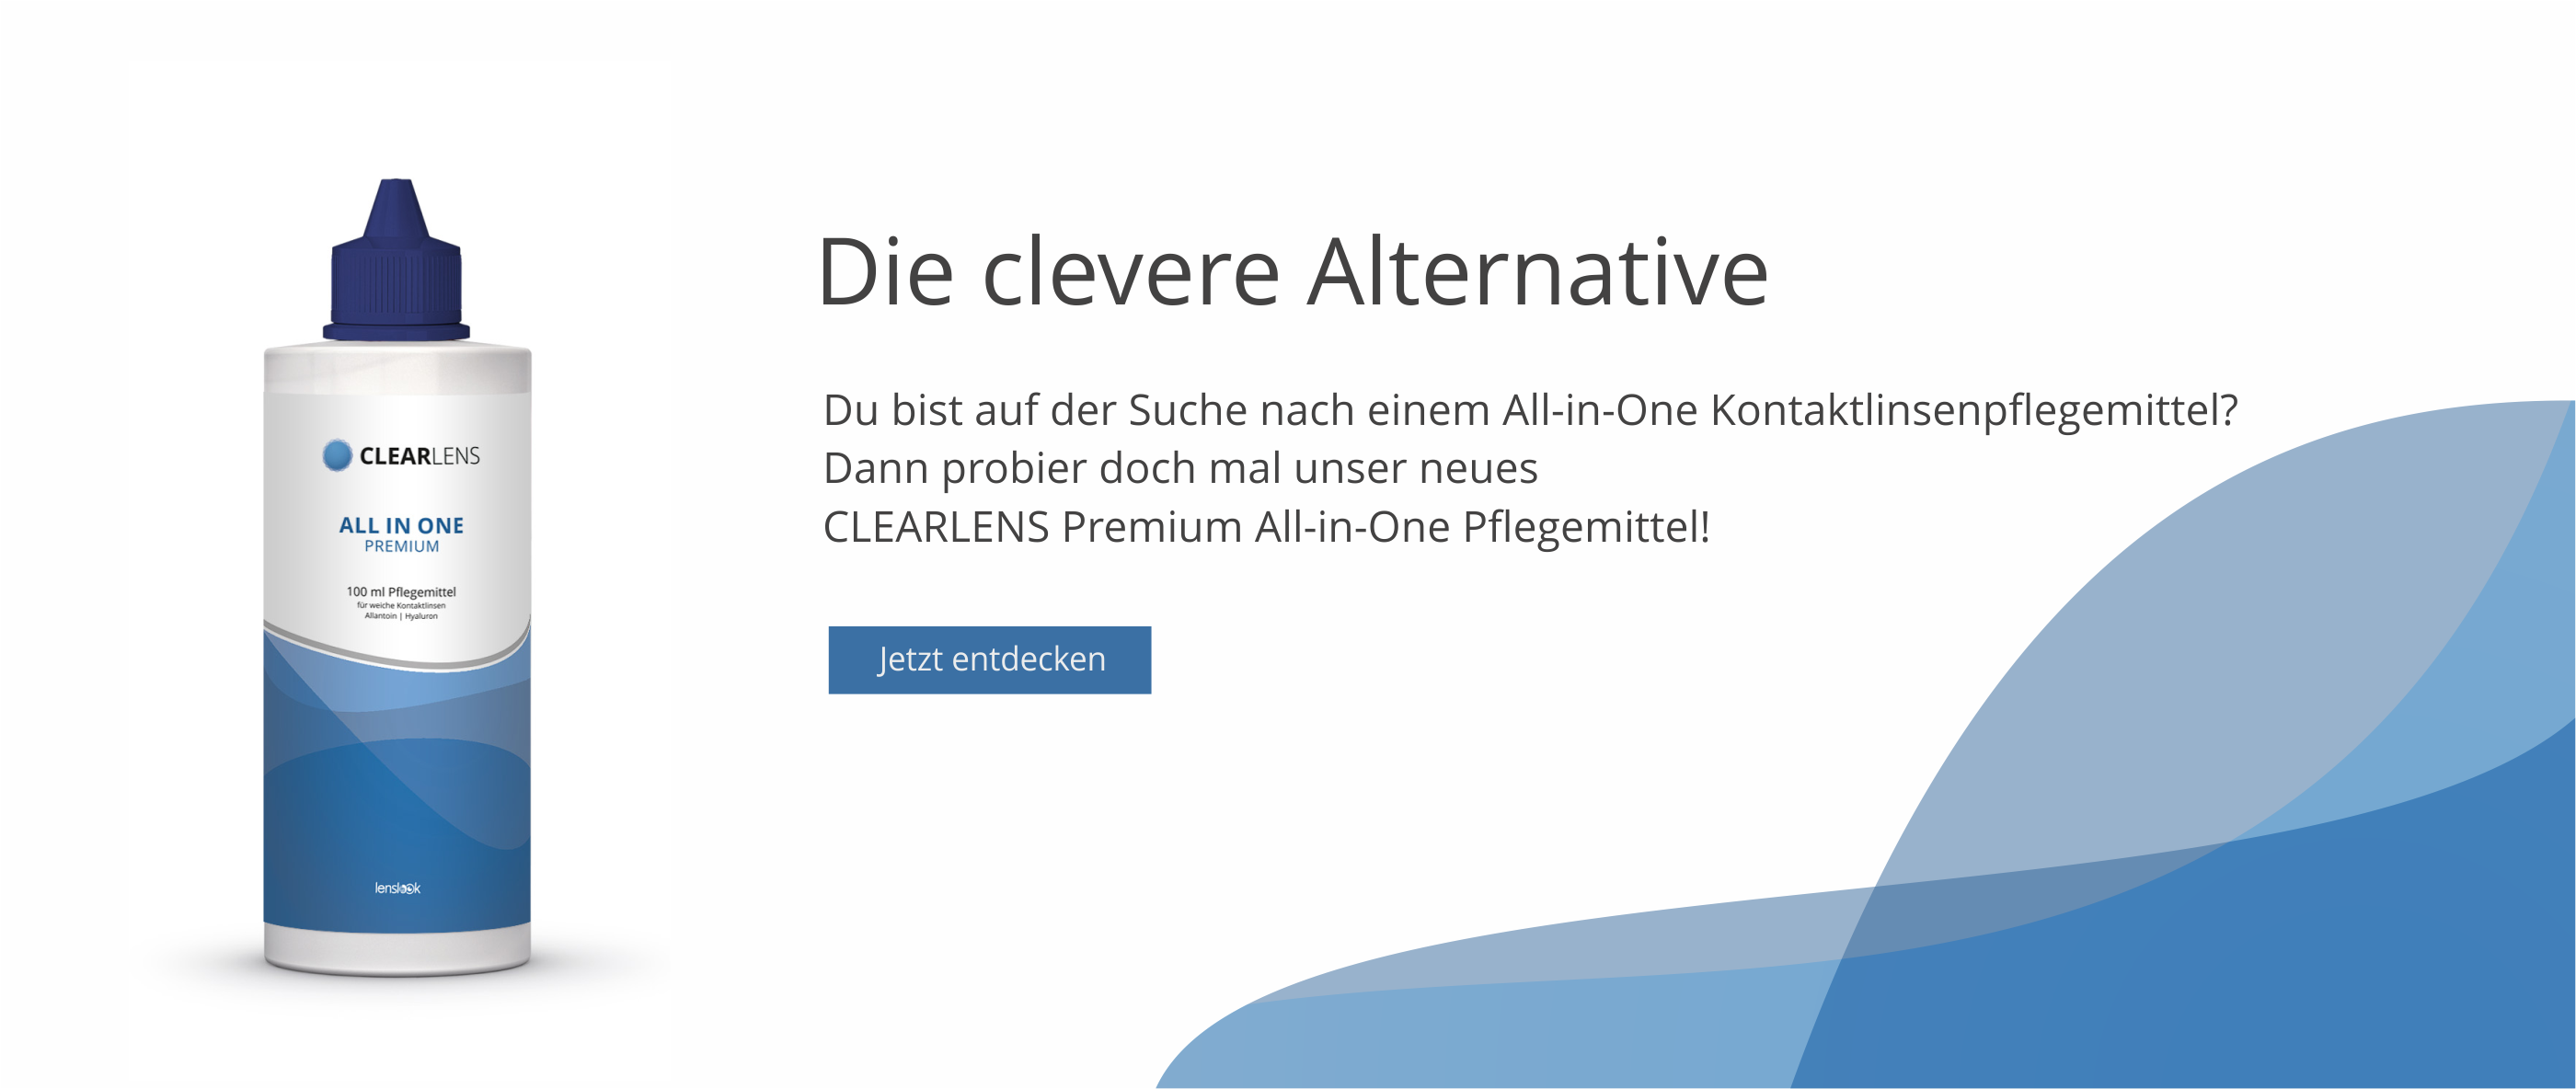 ClearLens_Alternative_100ml